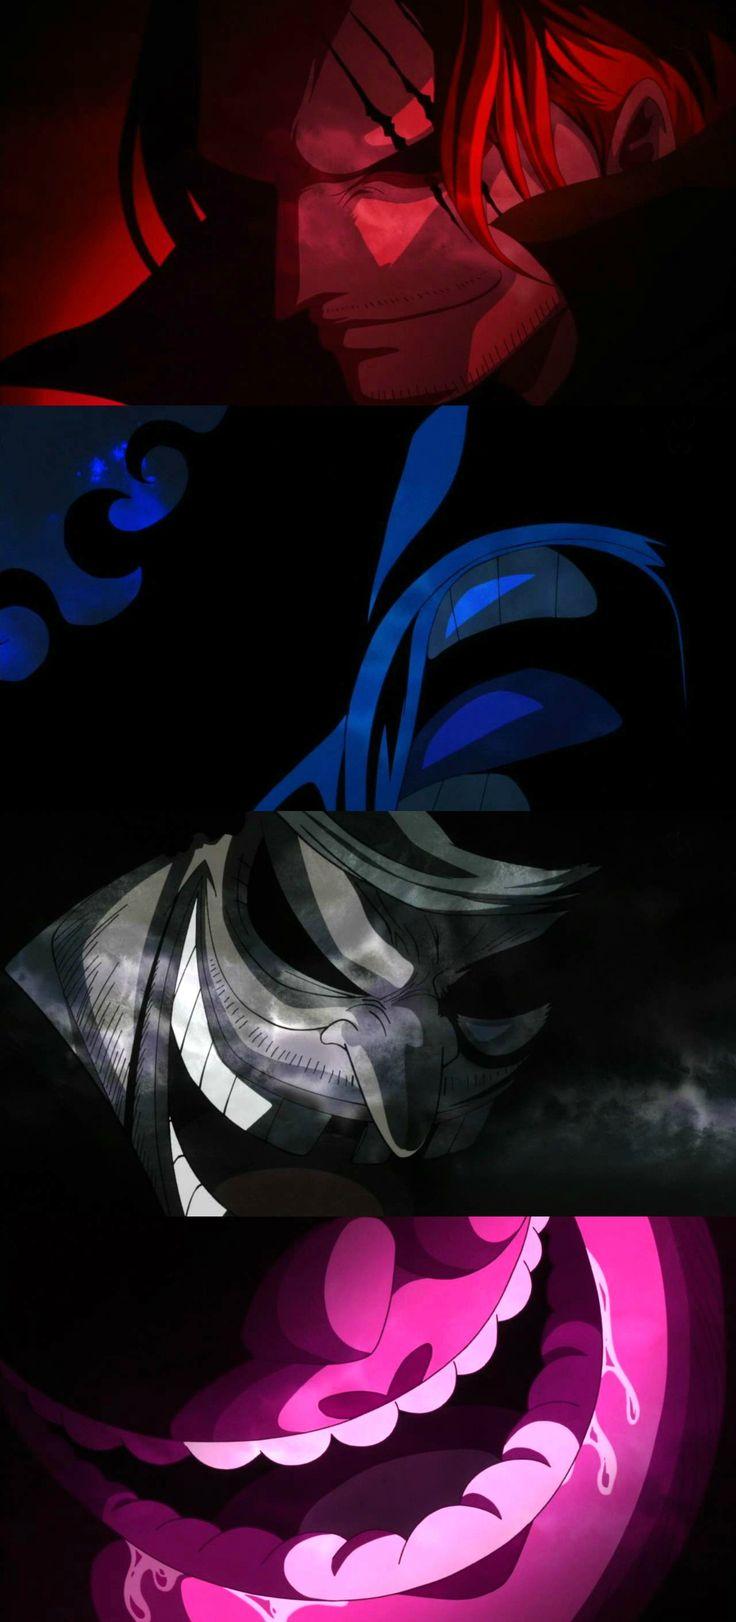 One Piece Anime | Yonko | Four Emperors | Shanks, Kaido, Blackbeard, Big Mom